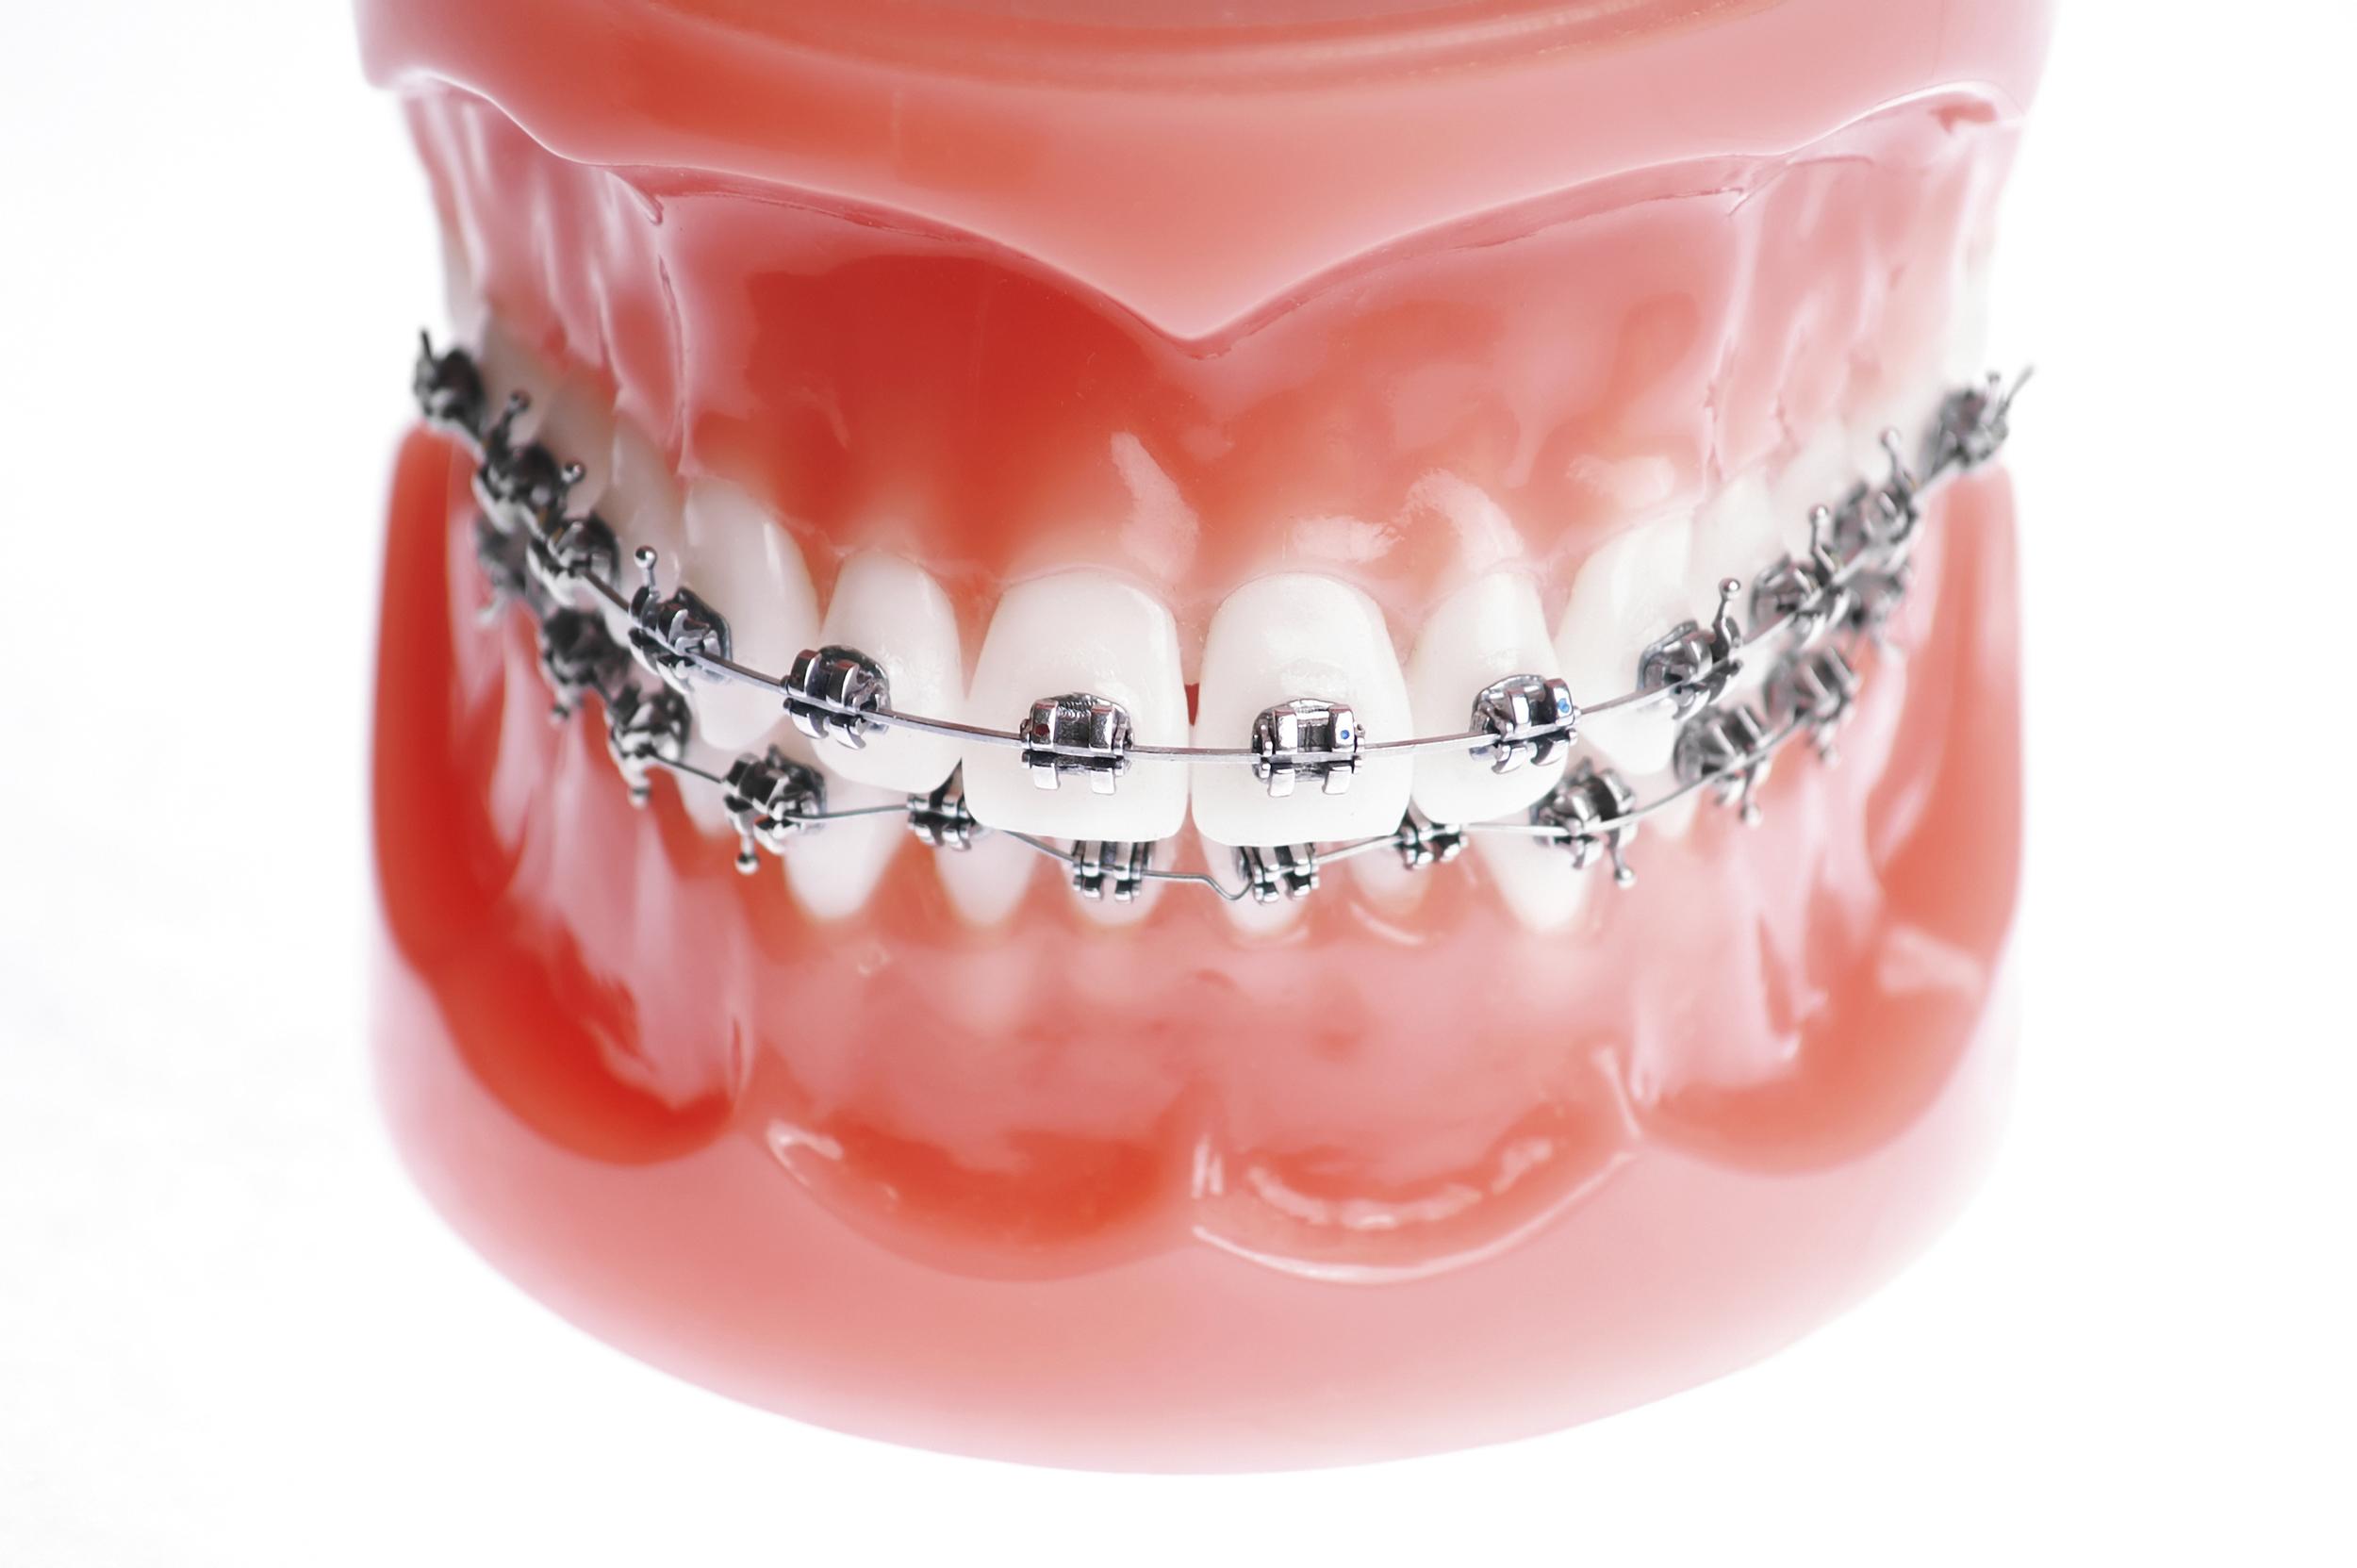 Kawa Orthodontics - Braces Boca Raton - Orthodontics Kawa Orthodontics - Florida - Orthodontist Boca Raton